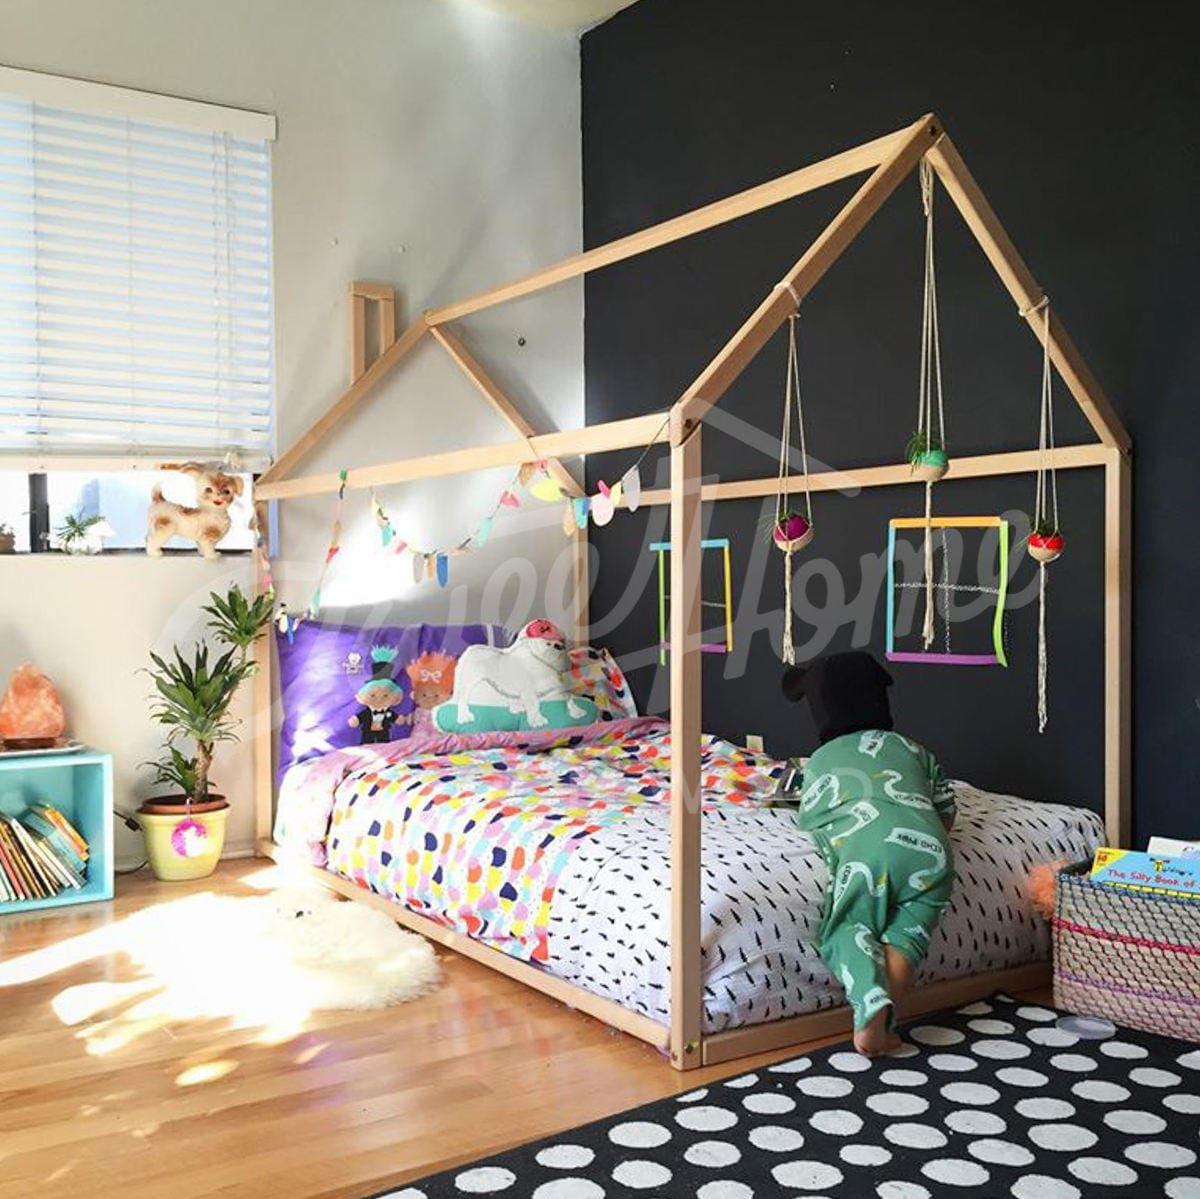 Kleinkind-Bett Haus Bett Kinderbett Holzhaus Zelt Bett | Etsy